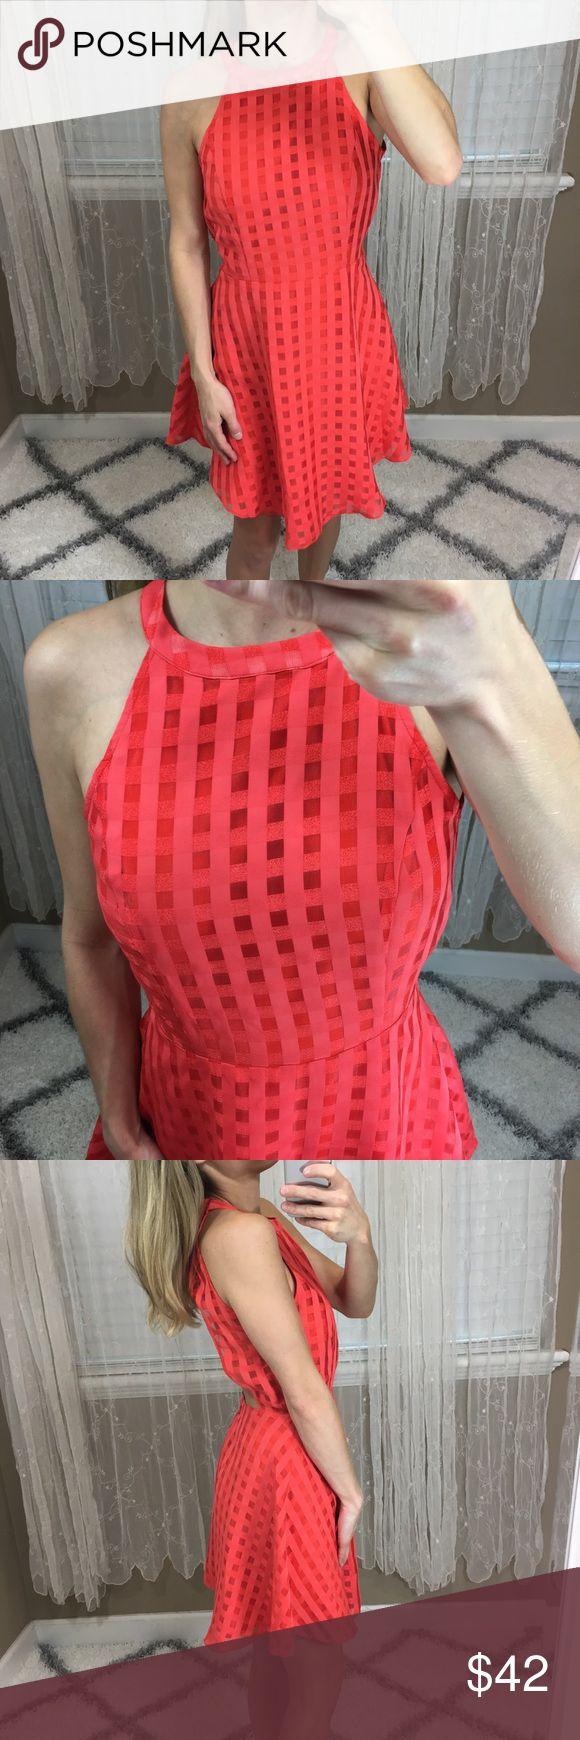 (Lovers+Friends) Orange Mini Dress - Size M Lovers and friends orange mini dress - size Medium. Excellent condition.  Buttons around neck. No trades  -- BIN G  #loversandfriends #orange #minidress Lovers + Friends Dresses Mini